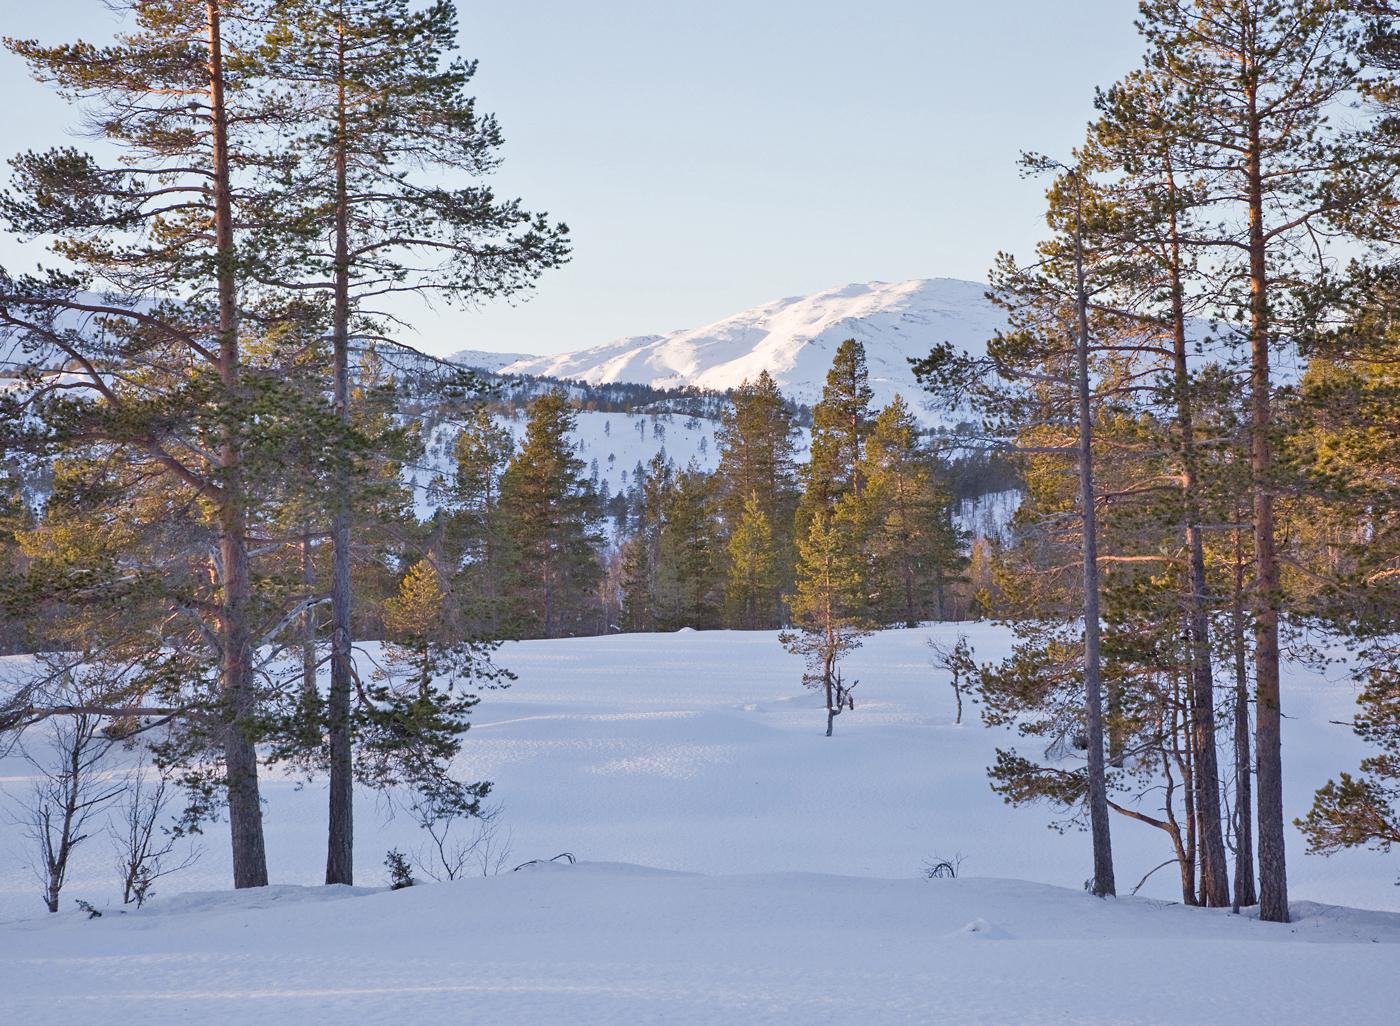 180118c-Sandfjellet.jpg